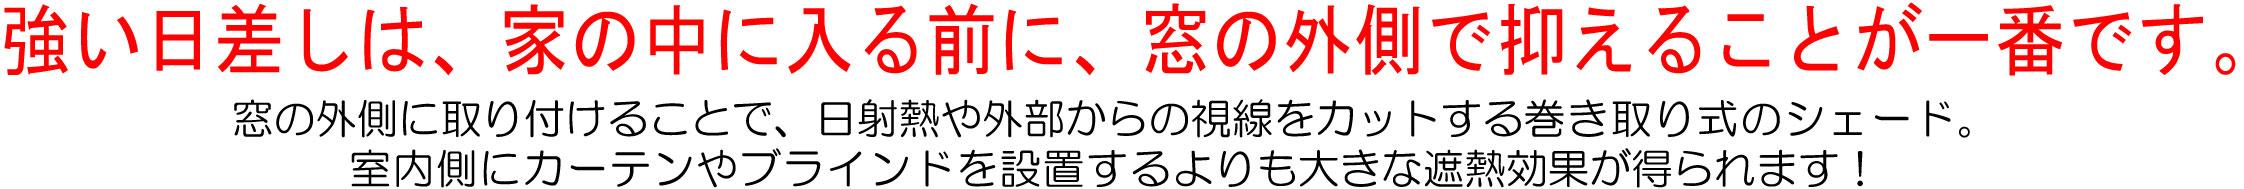 KuraSi-natu-sin62-18.jpg